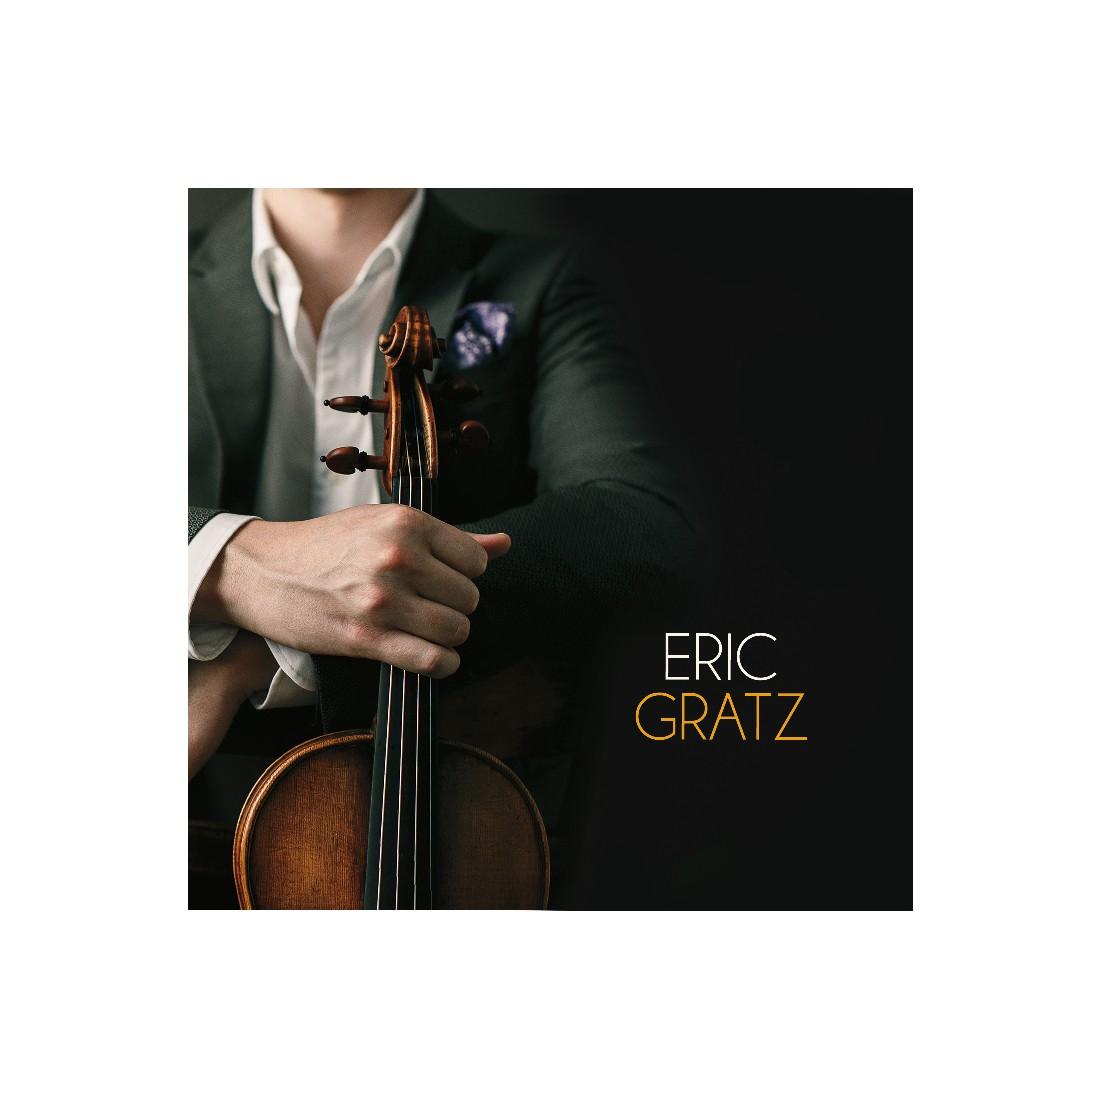 Design debut album artwork for young American concert violinist!